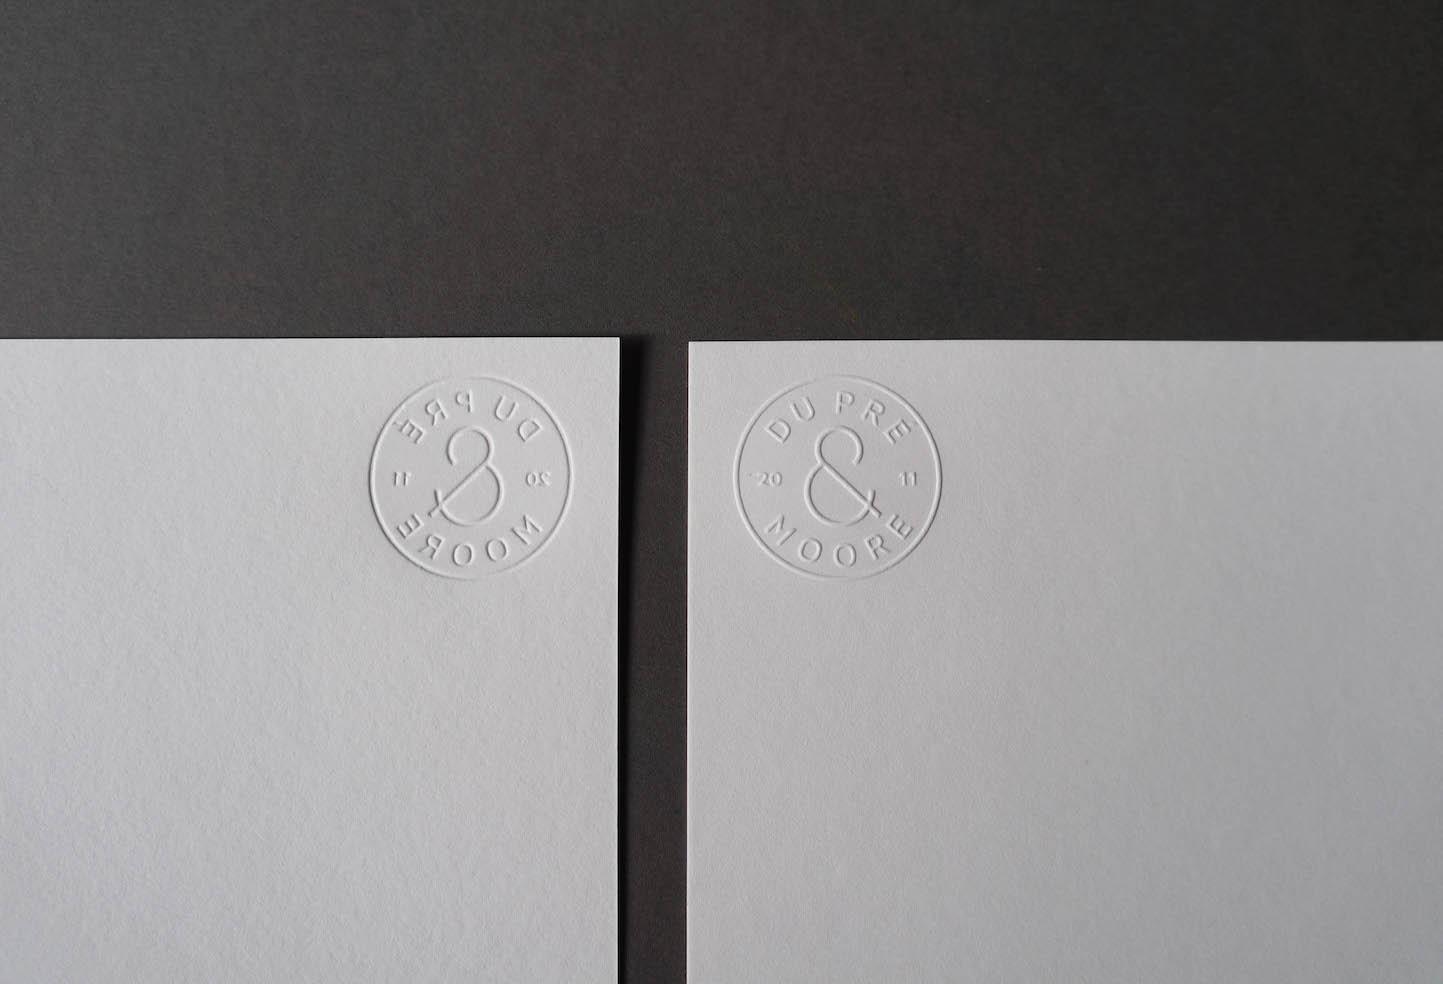 blind-emboss-logo-letterpress-dupremoore-with-comps